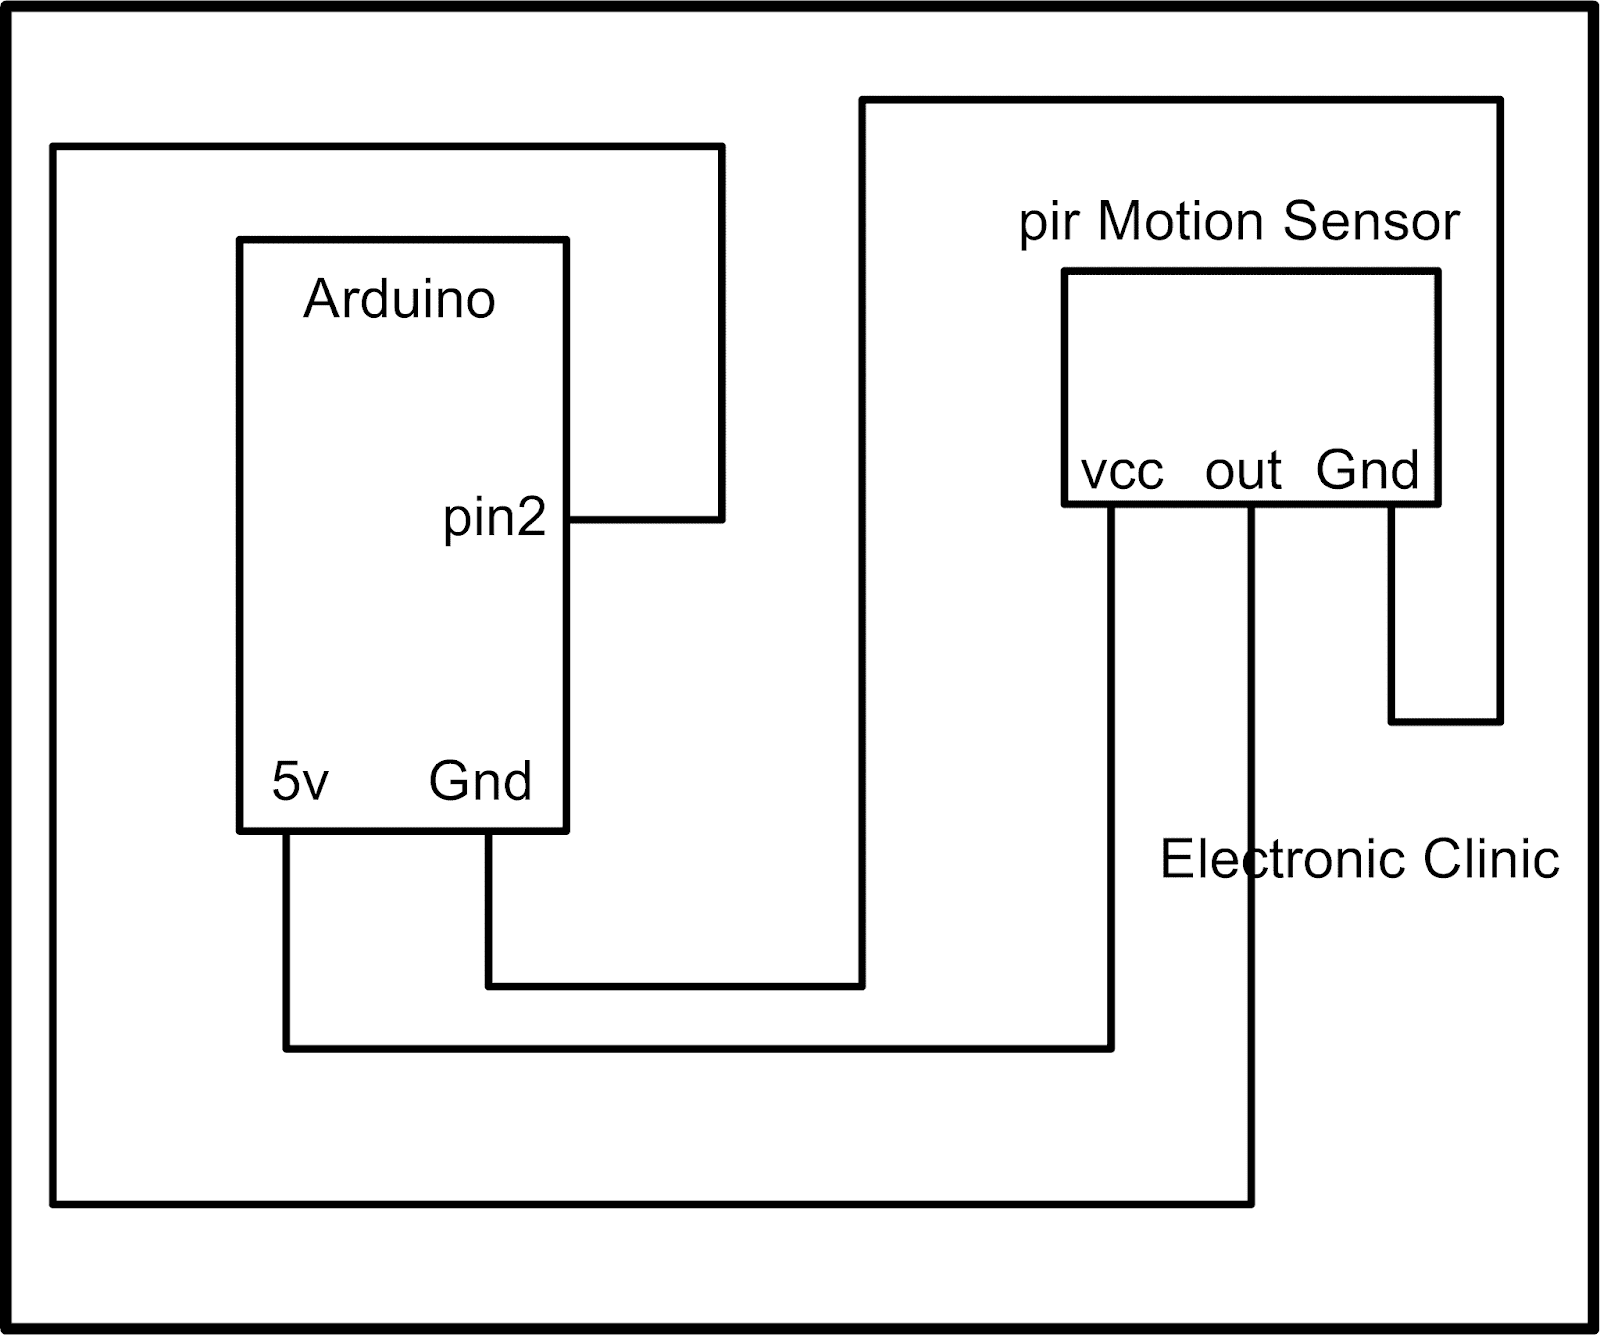 Arduino Plc Scada Solidworks Image Processing Robotics Power Wiring Diagram Interfacing With Mega Circuit